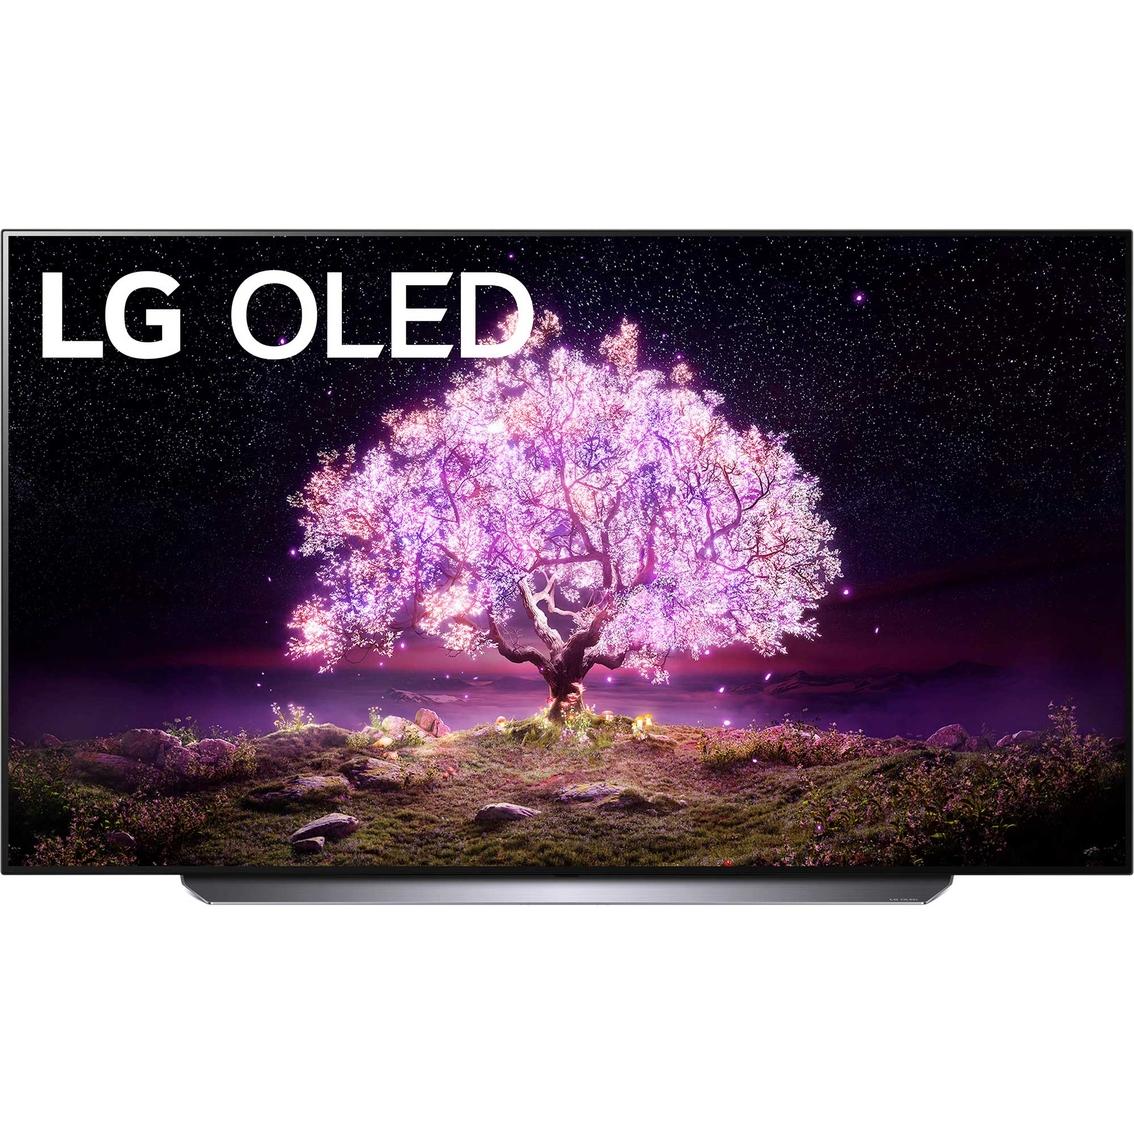 LG 65 in. C1 OLED 4K UHD HDR Smart TV with AI ThinQ OLED65C1PUB $1899